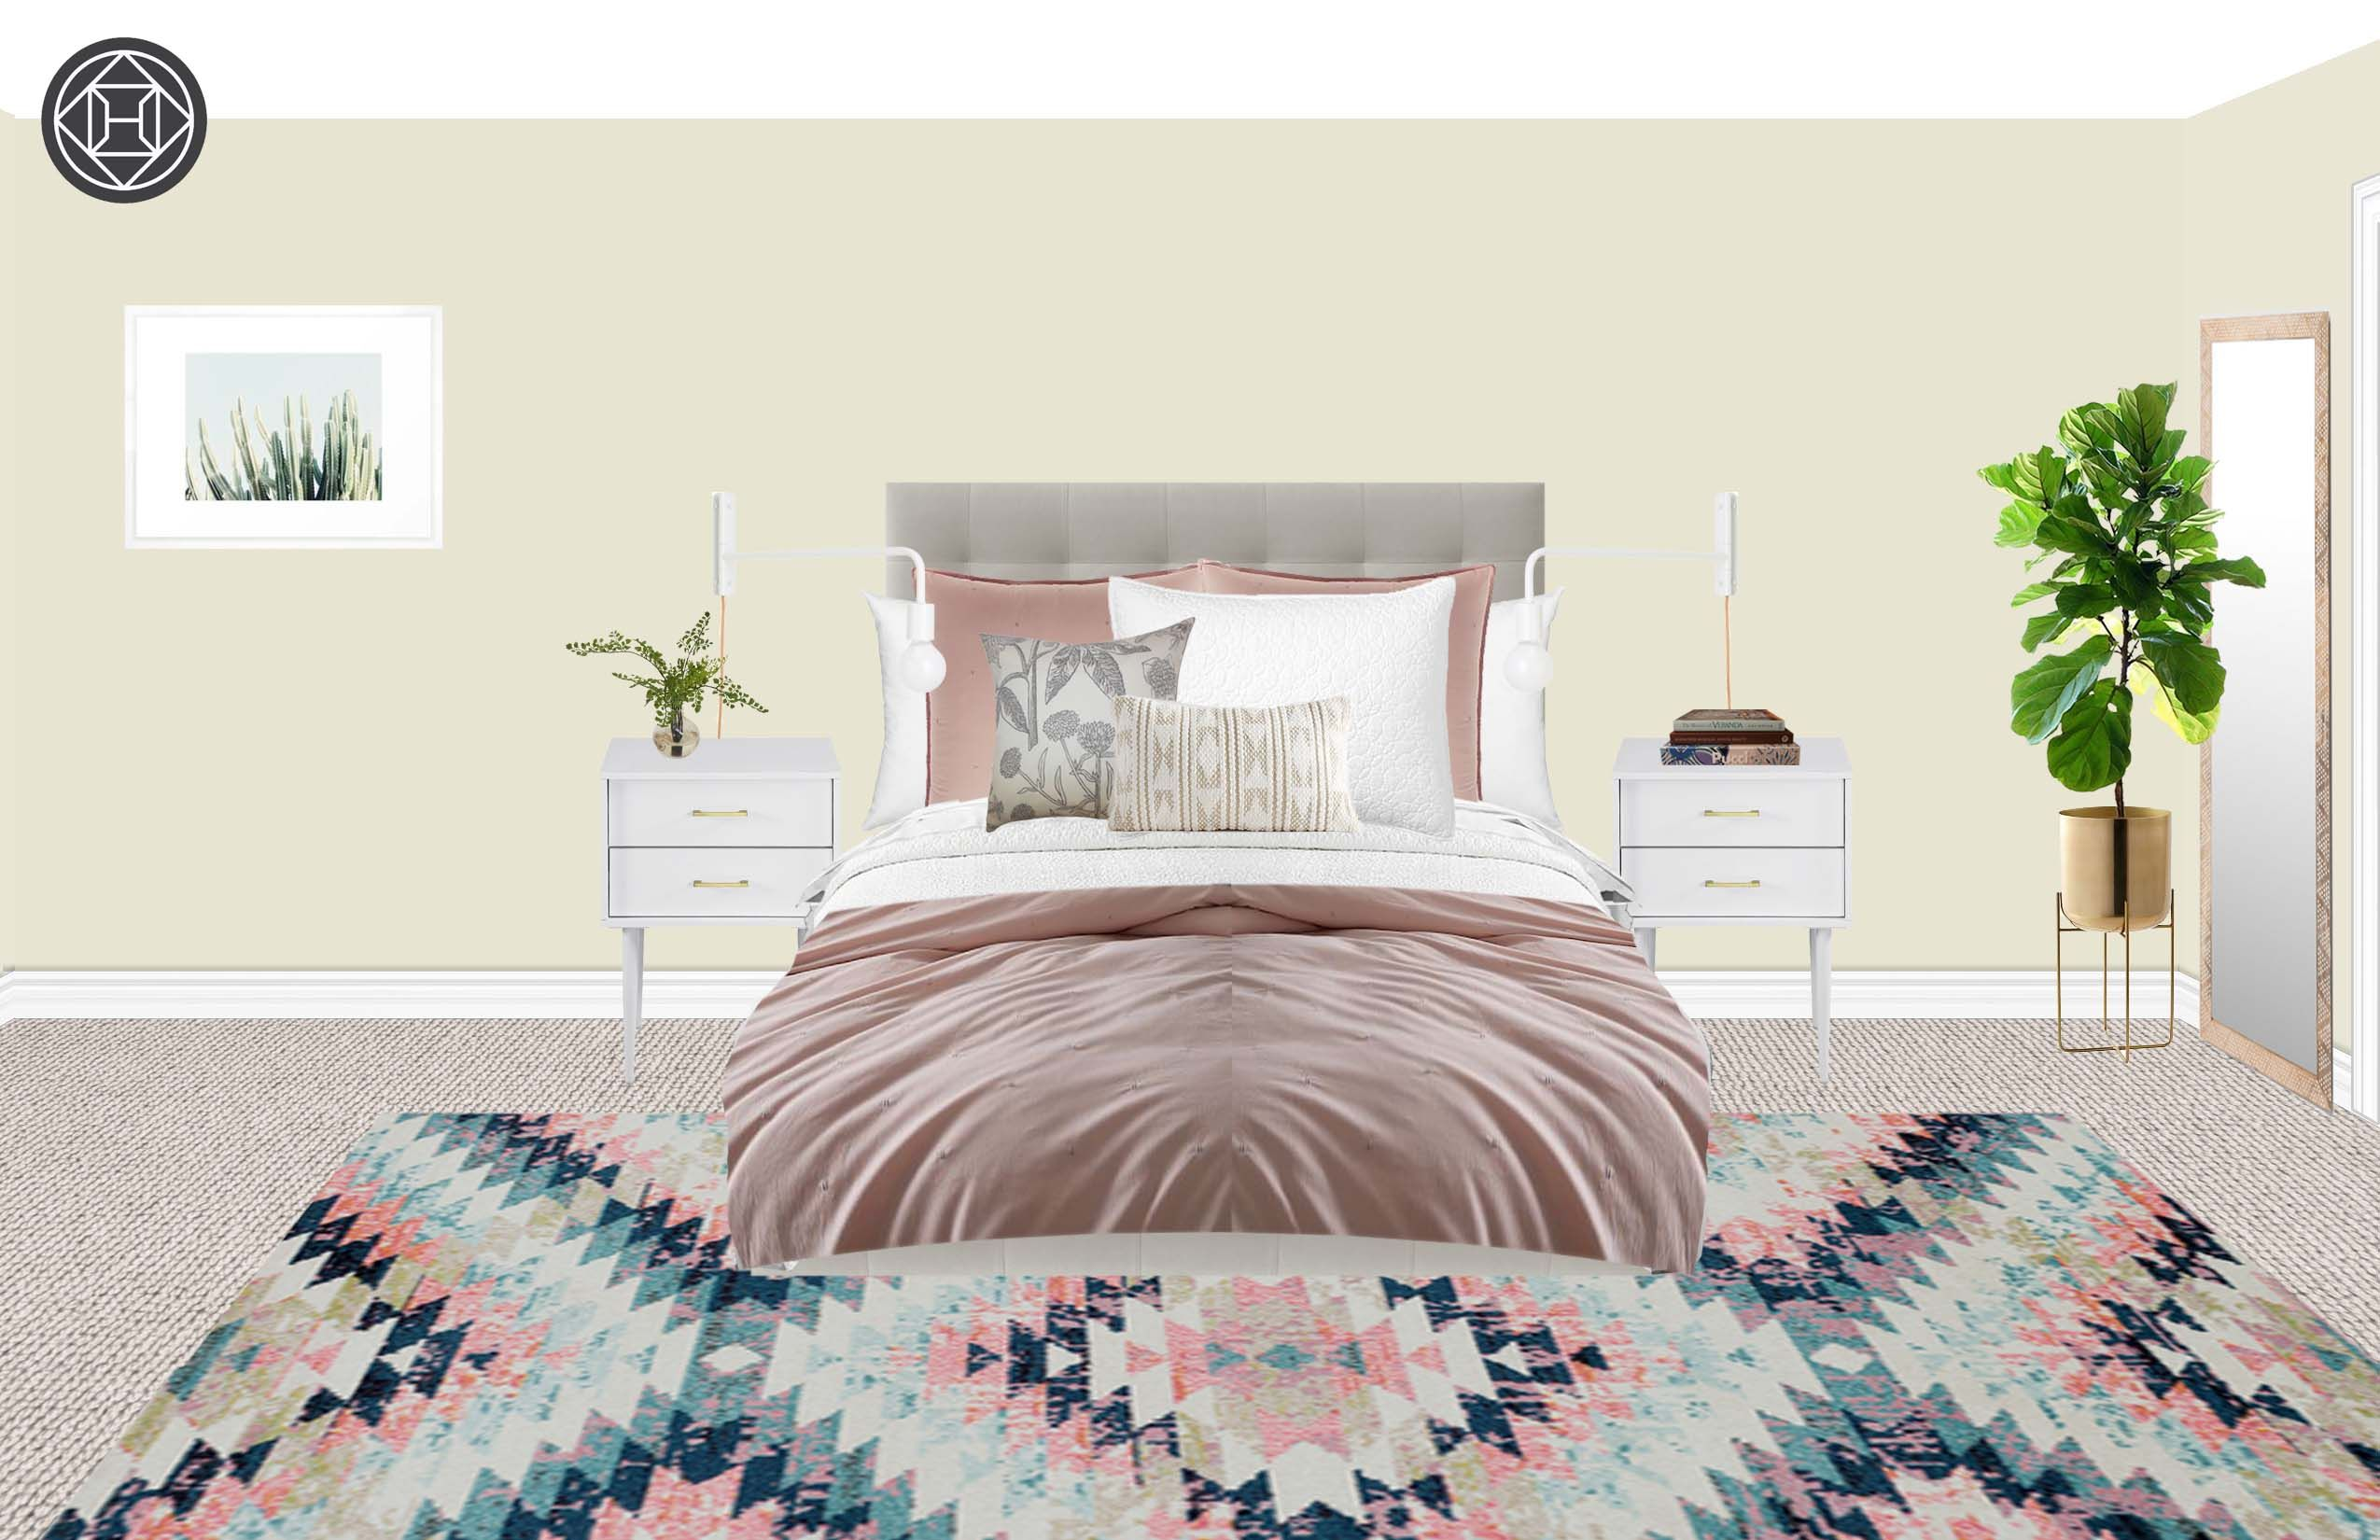 Modern, Glam, Industrial Bedroom Design by Havenly